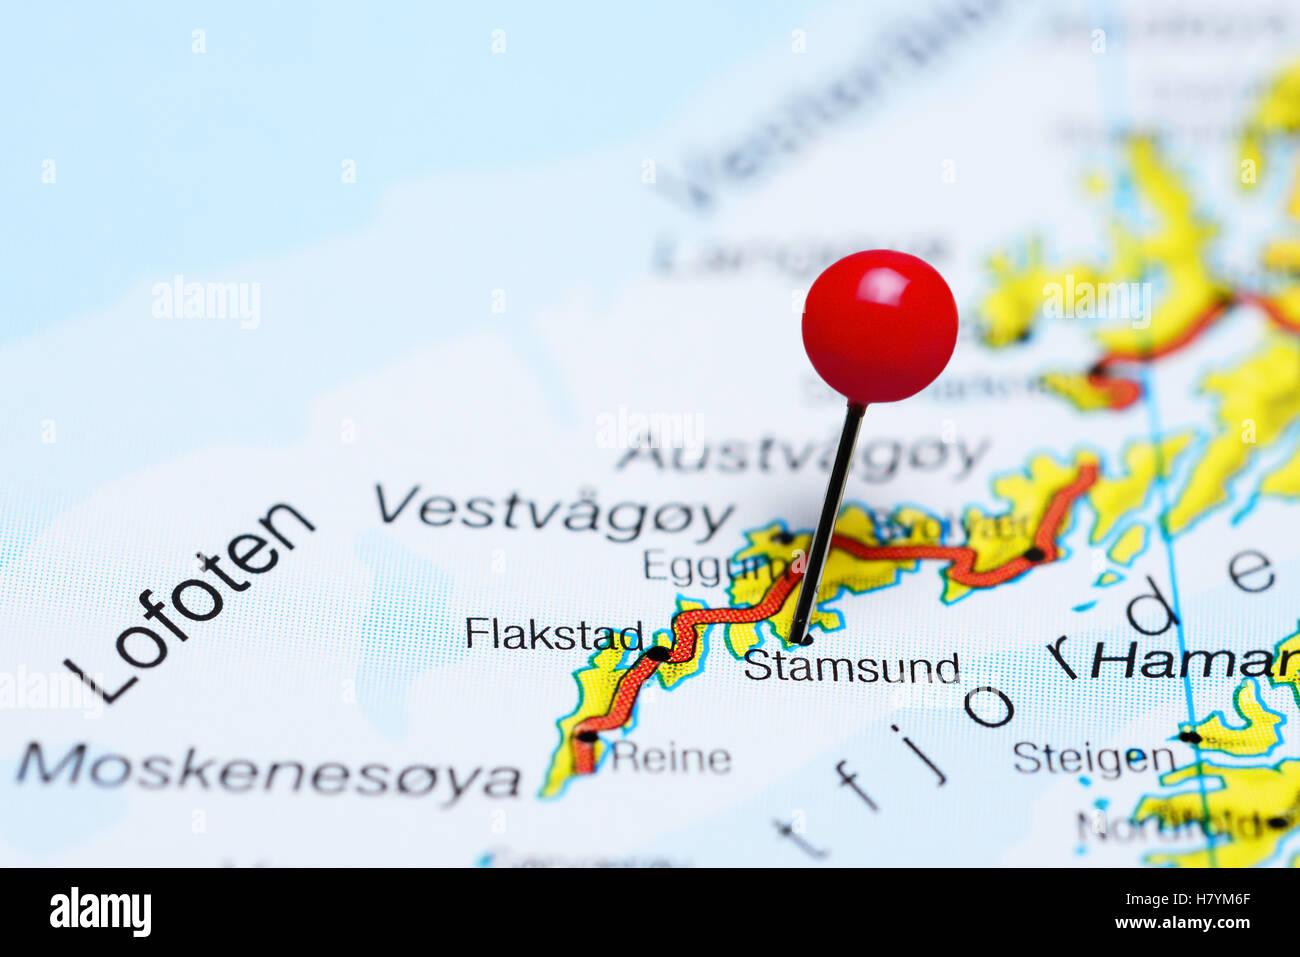 Stamsund Pinned On A Map Of Lofoten Islands Norway Stock Photo - Norway map lofoten islands